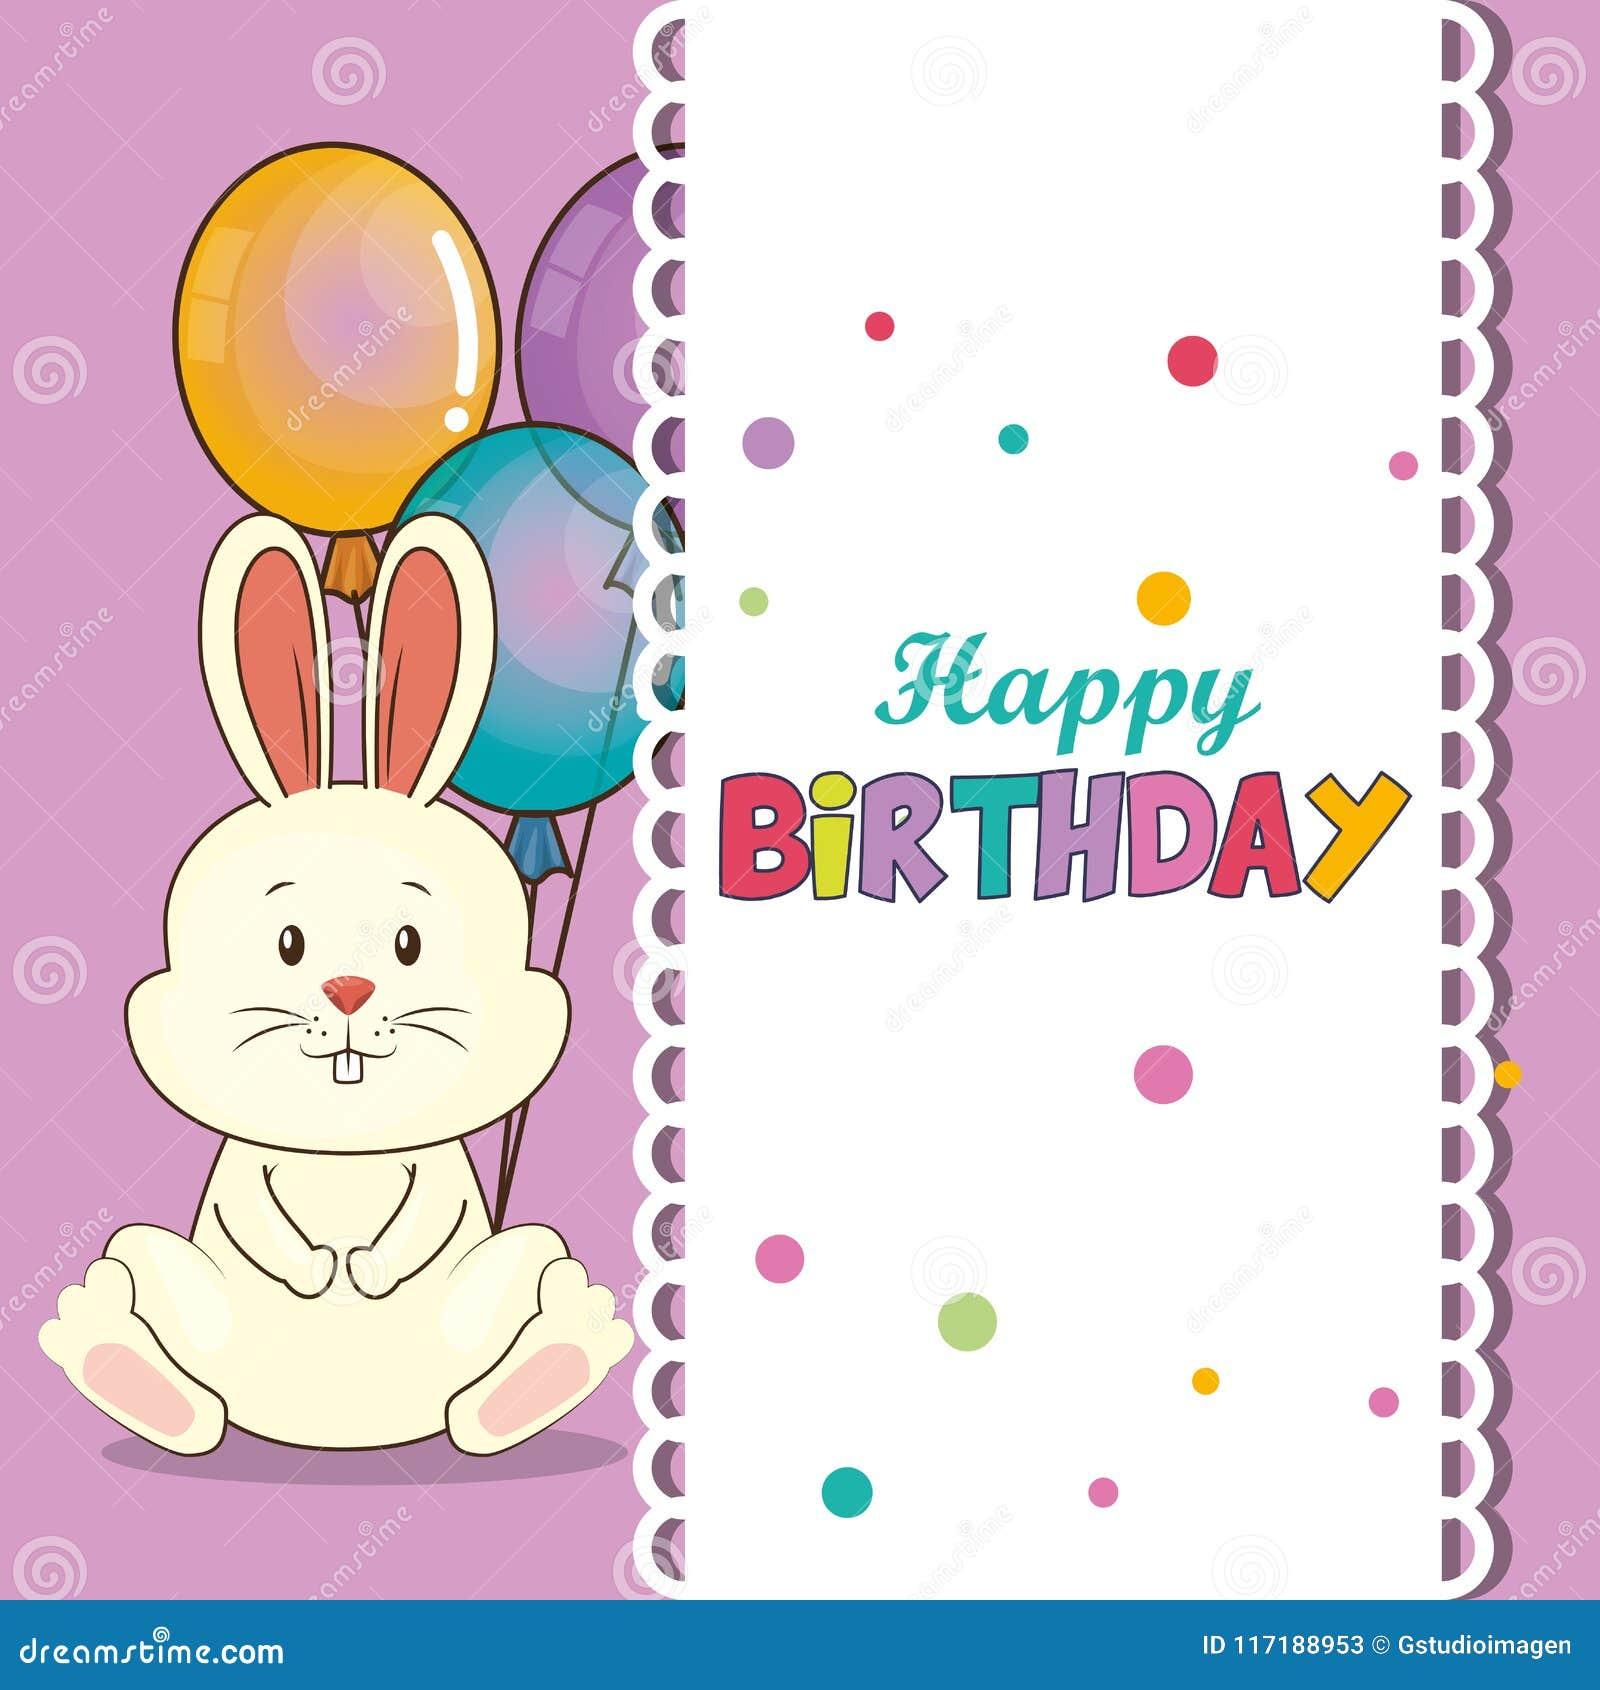 Happy Birthday Card With Cute Rabbit